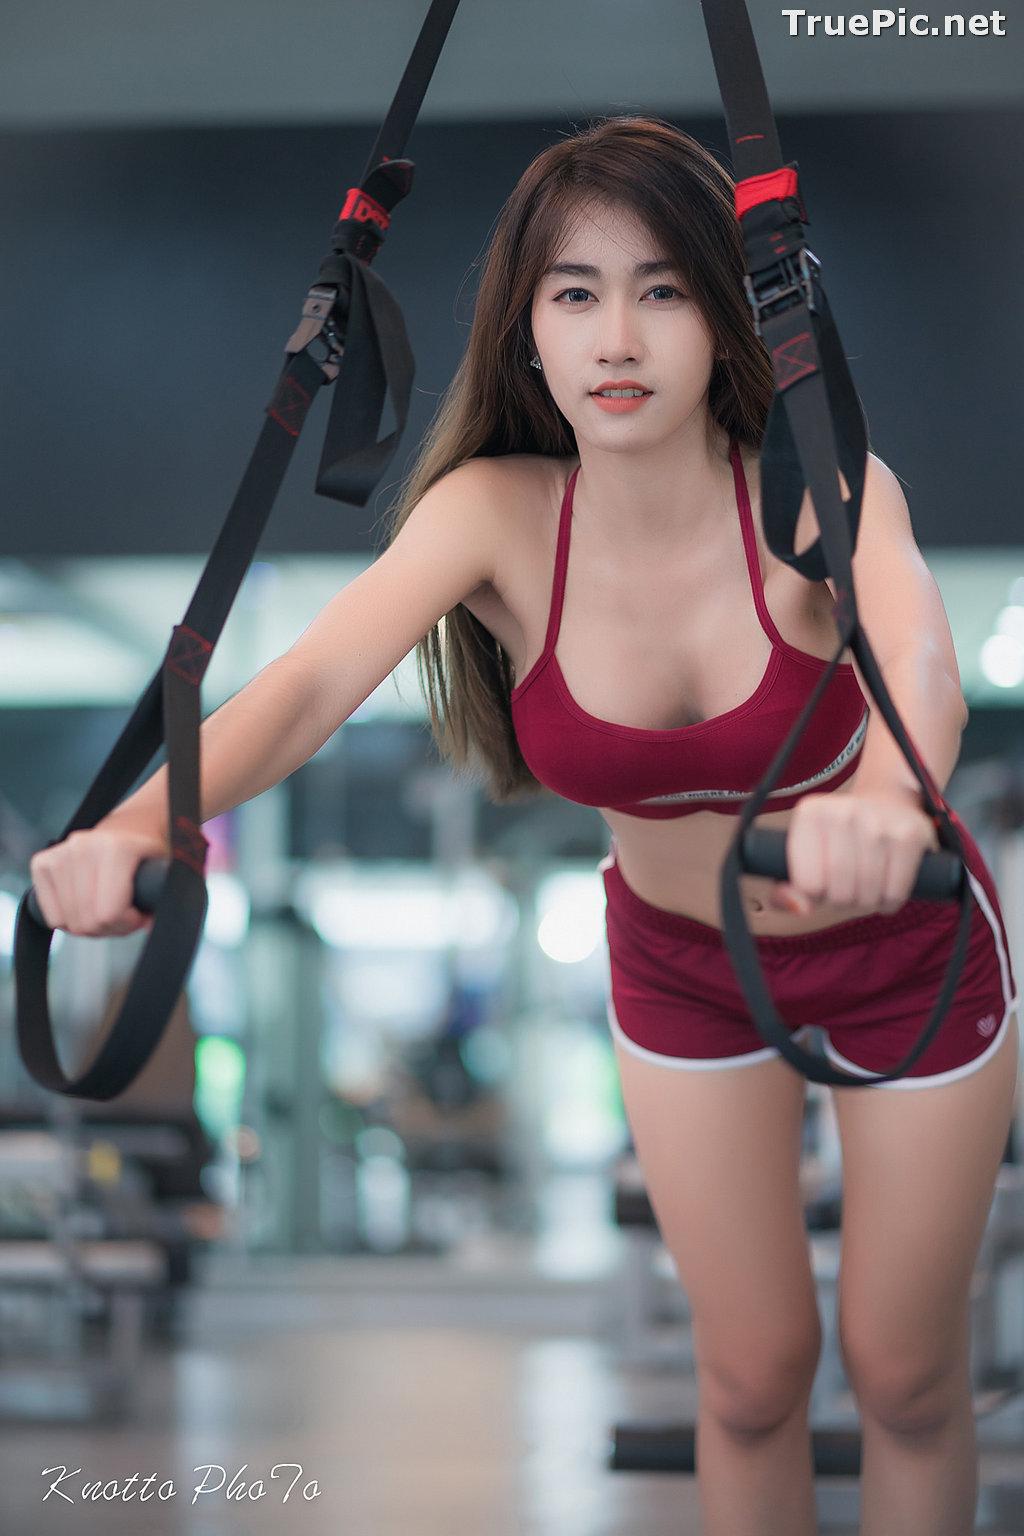 Image Thailand Hot Beauty Model - Nisa Khamarat - Red and Black Fitness Set - TruePic.net - Picture-3